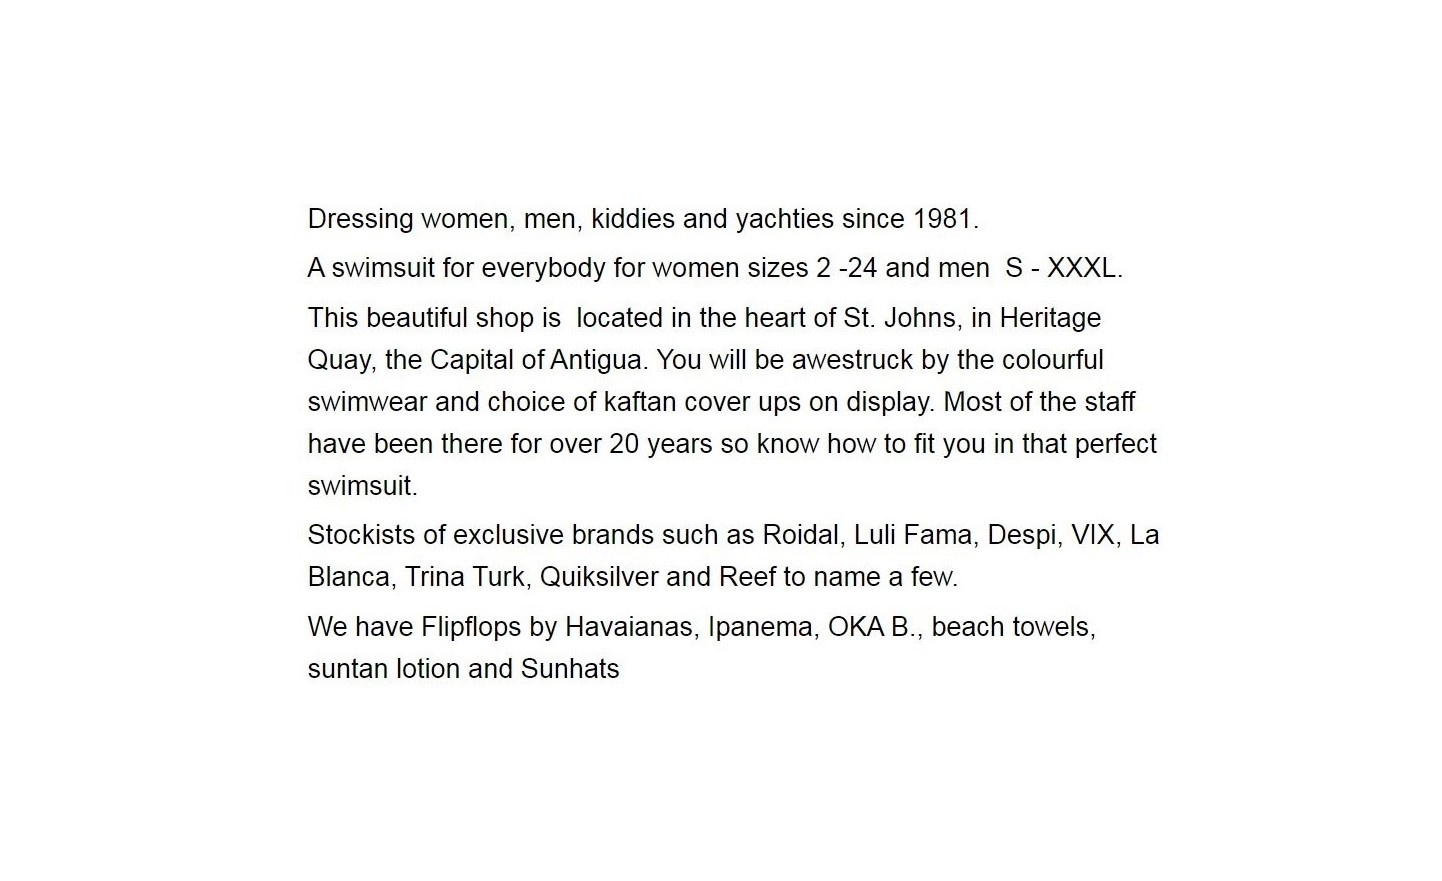 Dressing women, men, kiddies and yachties since 1981